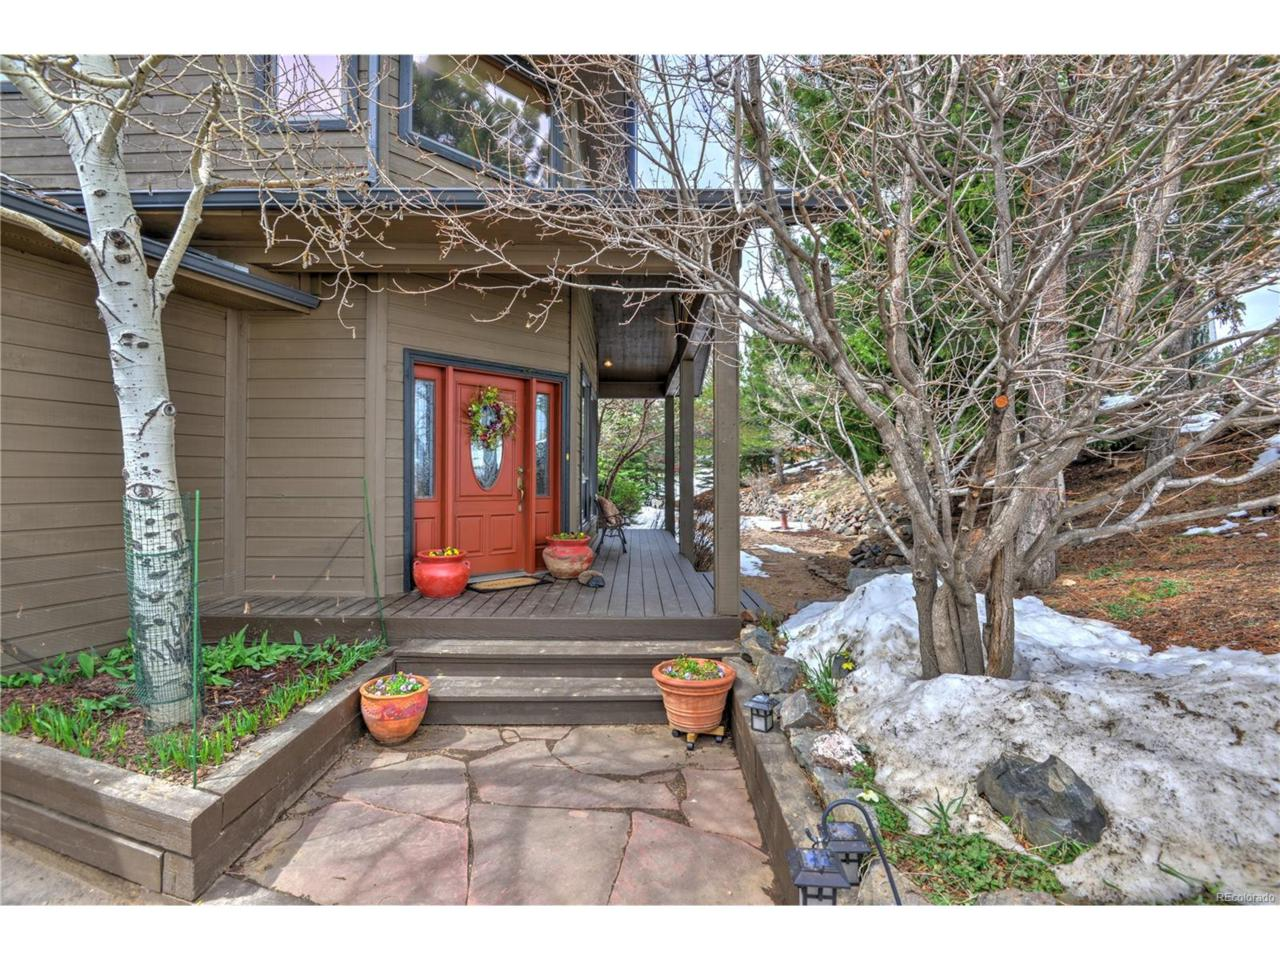 215 Alpine Avenue, Golden, CO 80401 (MLS #7479111) :: 8z Real Estate